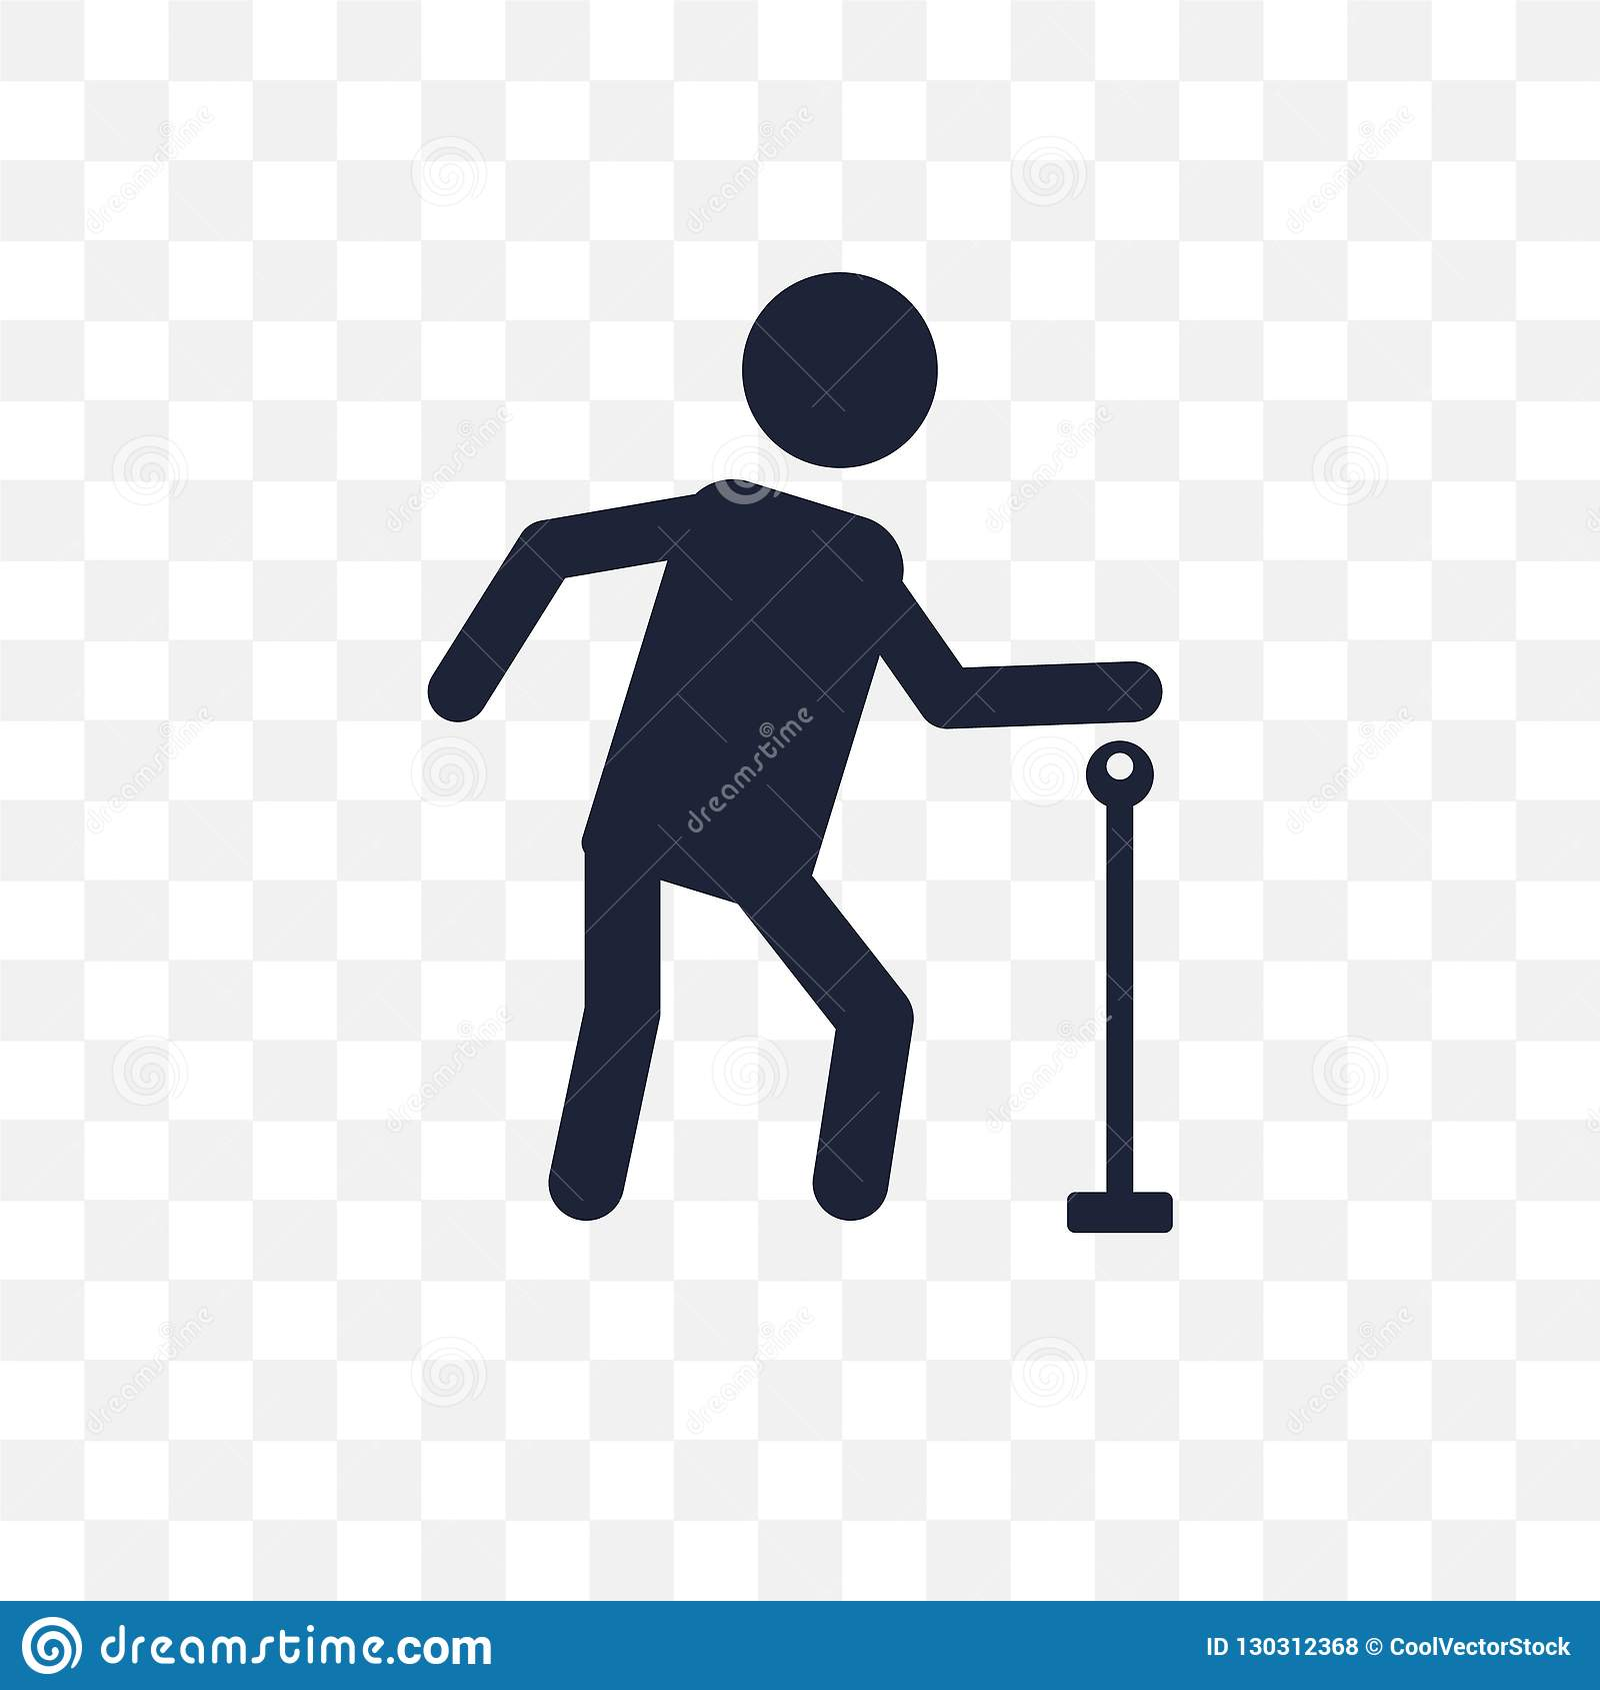 Elderly transparent icon. Elderly symbol design from Insurance c